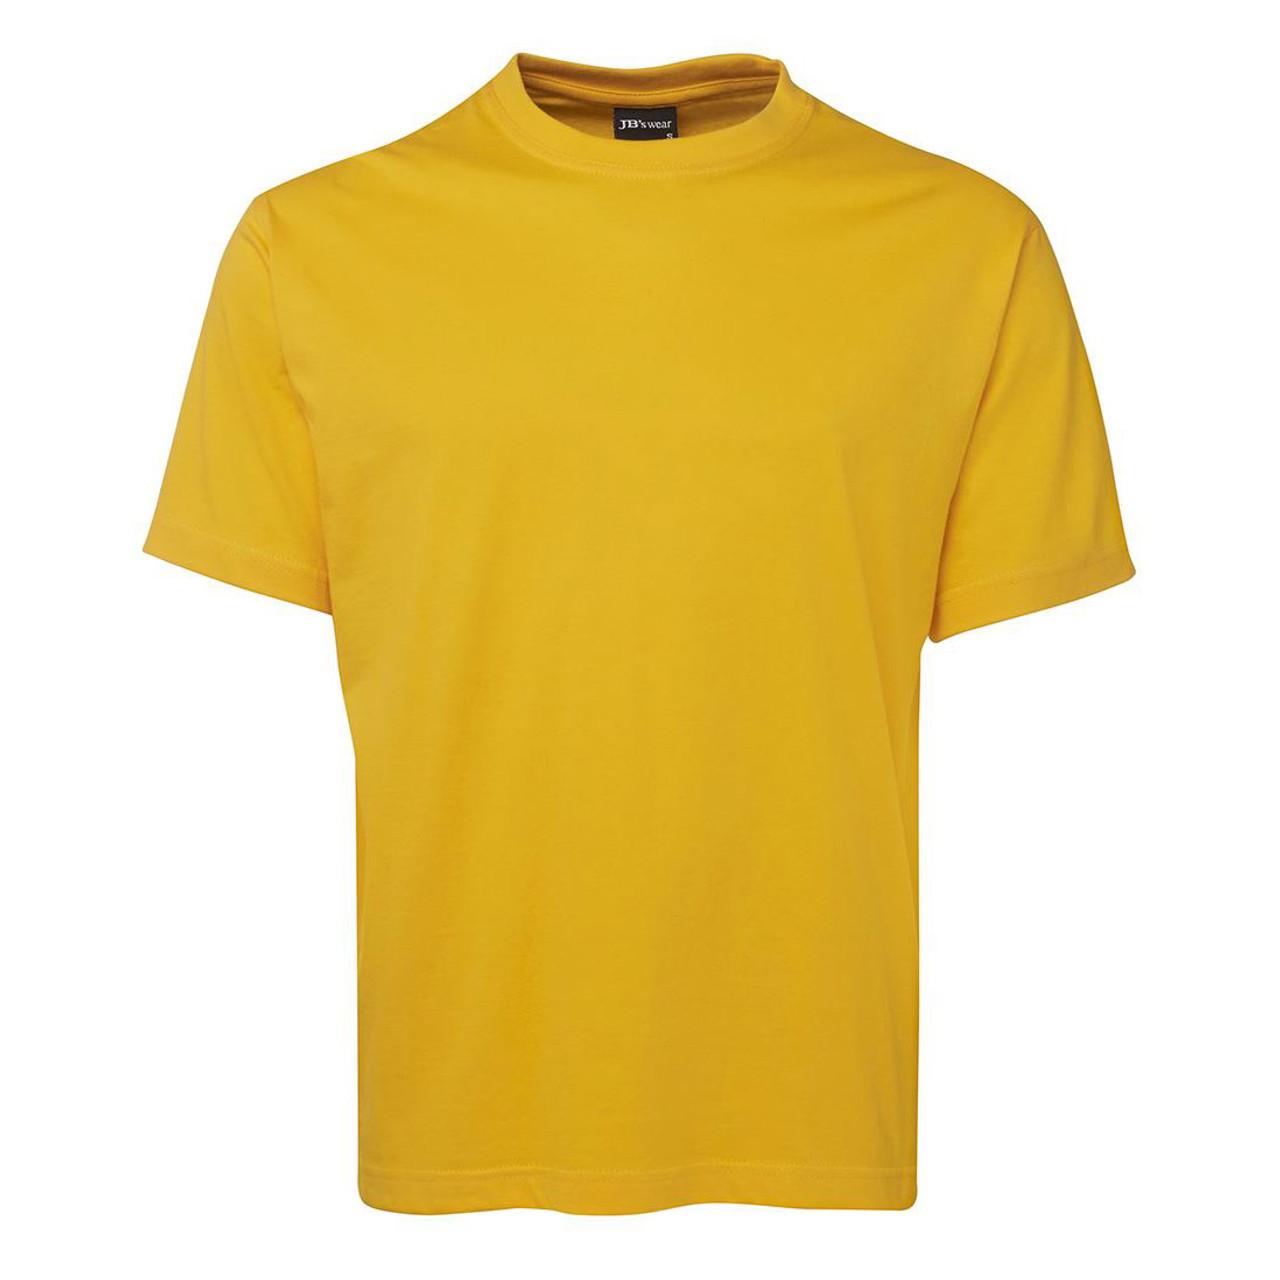 low priced 69b39 13b41 ECHO | Plain Jersey Cotton Crew Neck Tshirt